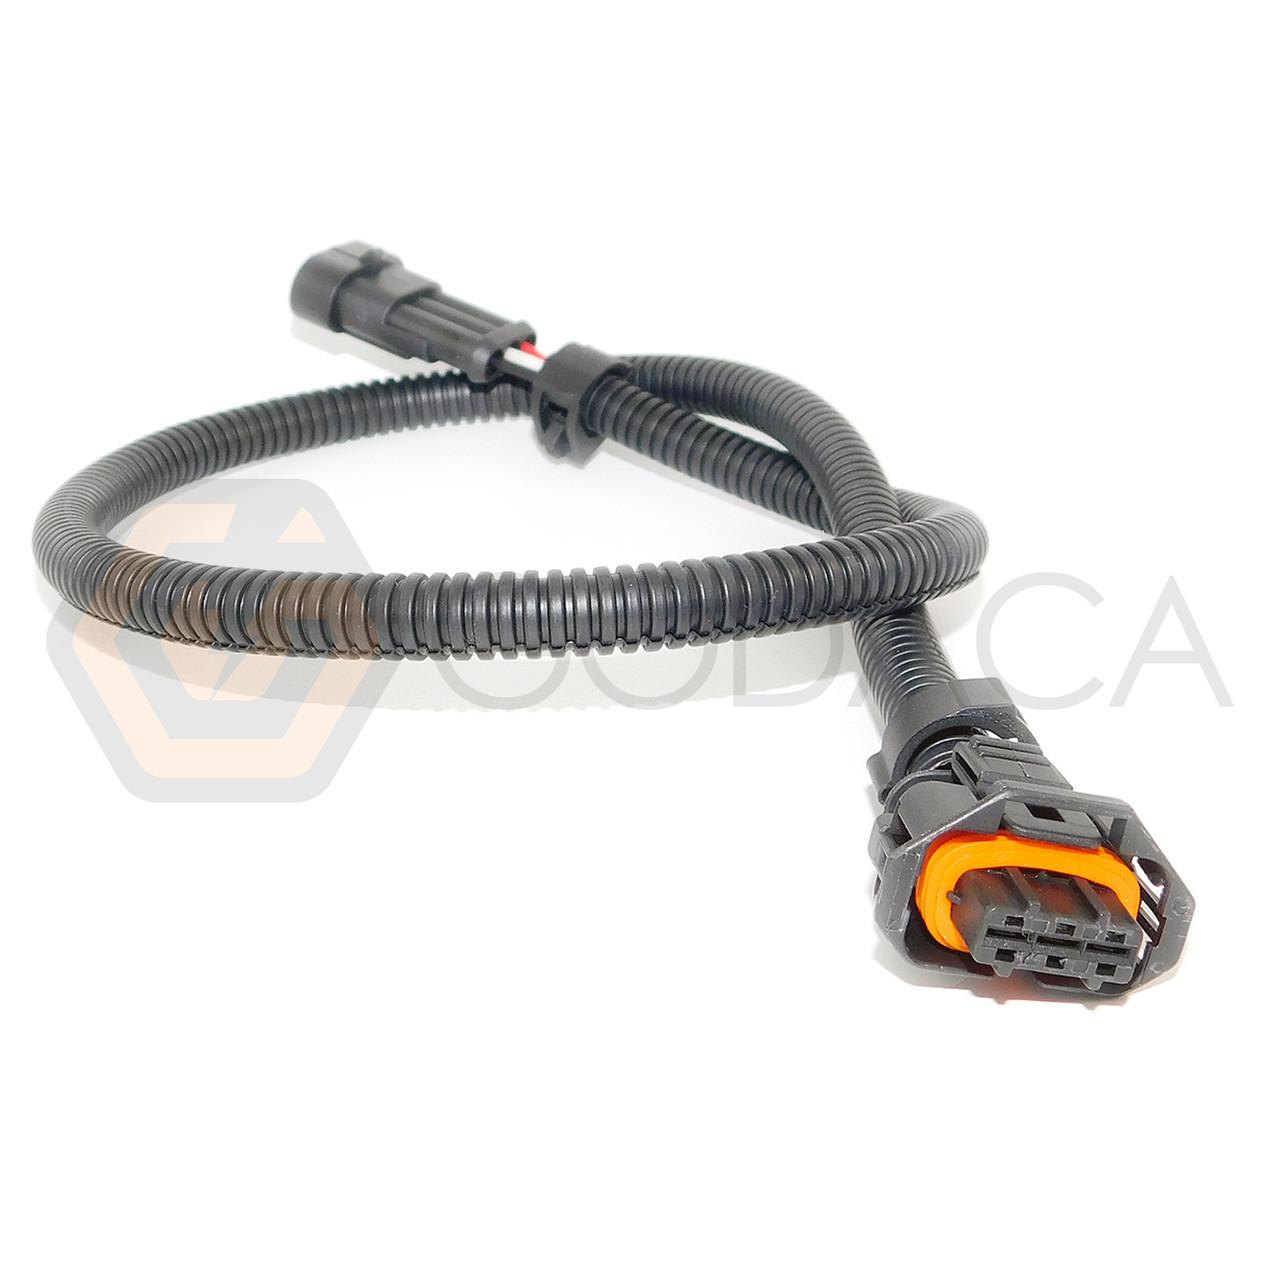 ls3 map sensor wiring wiring diagrams ford map sensor wiring diagram 1x wiring harness adapter for [ 1280 x 1280 Pixel ]